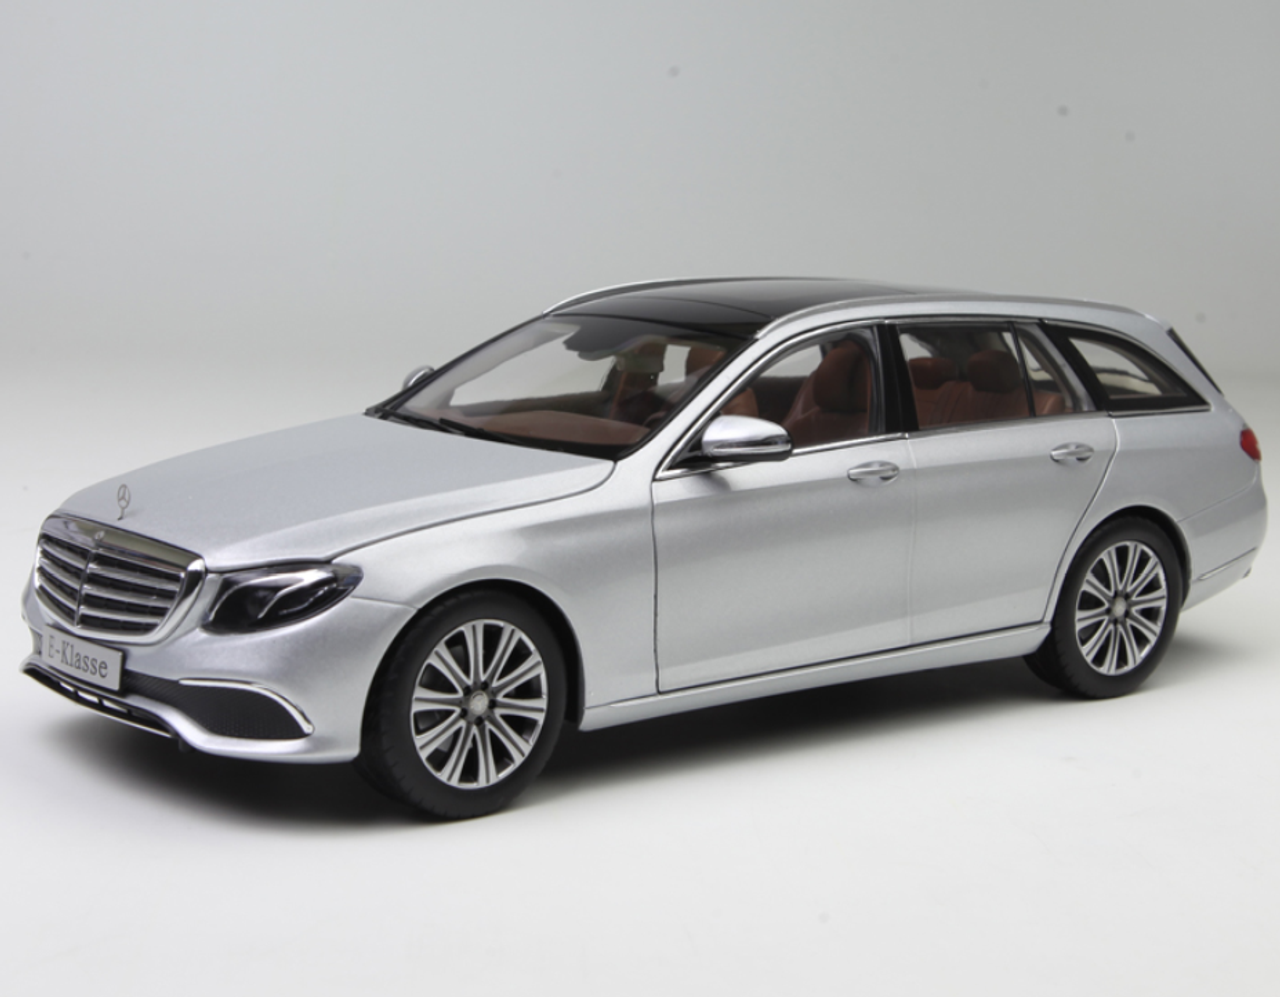 1//18 iScale Daimler Mercedes Benz E Class Klasse Diecast Model Car Gift Silver